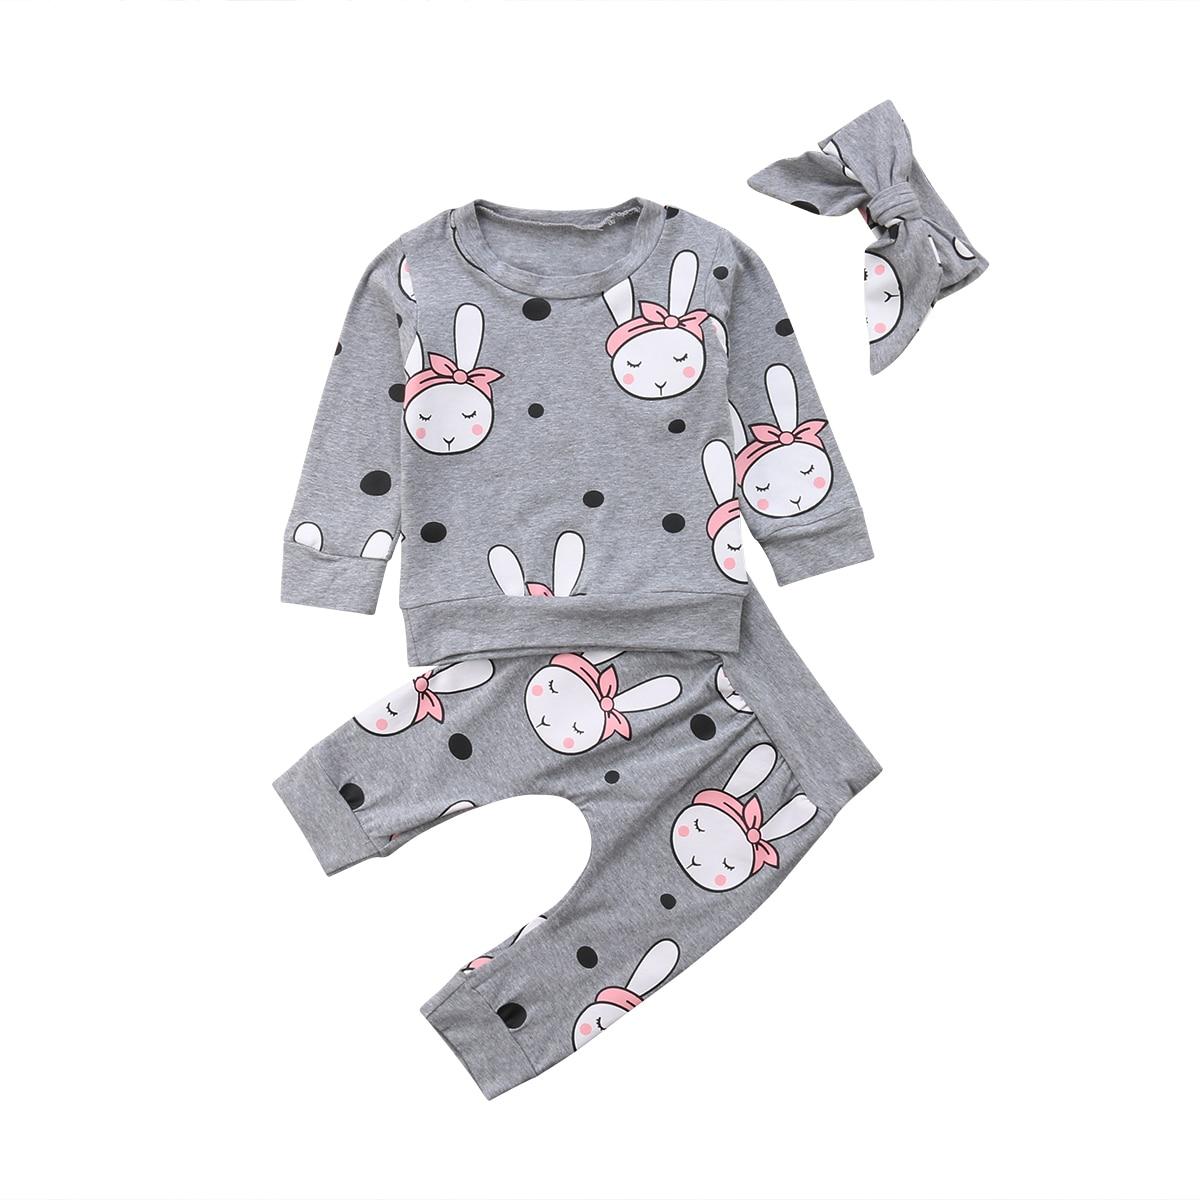 0-2 T Peuter Baby Meisje Kleding Sets Sweater T-shirt Tops Broek Lange Mouw Katoen Hoofdbanden 3 Stks Leuke Baby Set 0-24 M